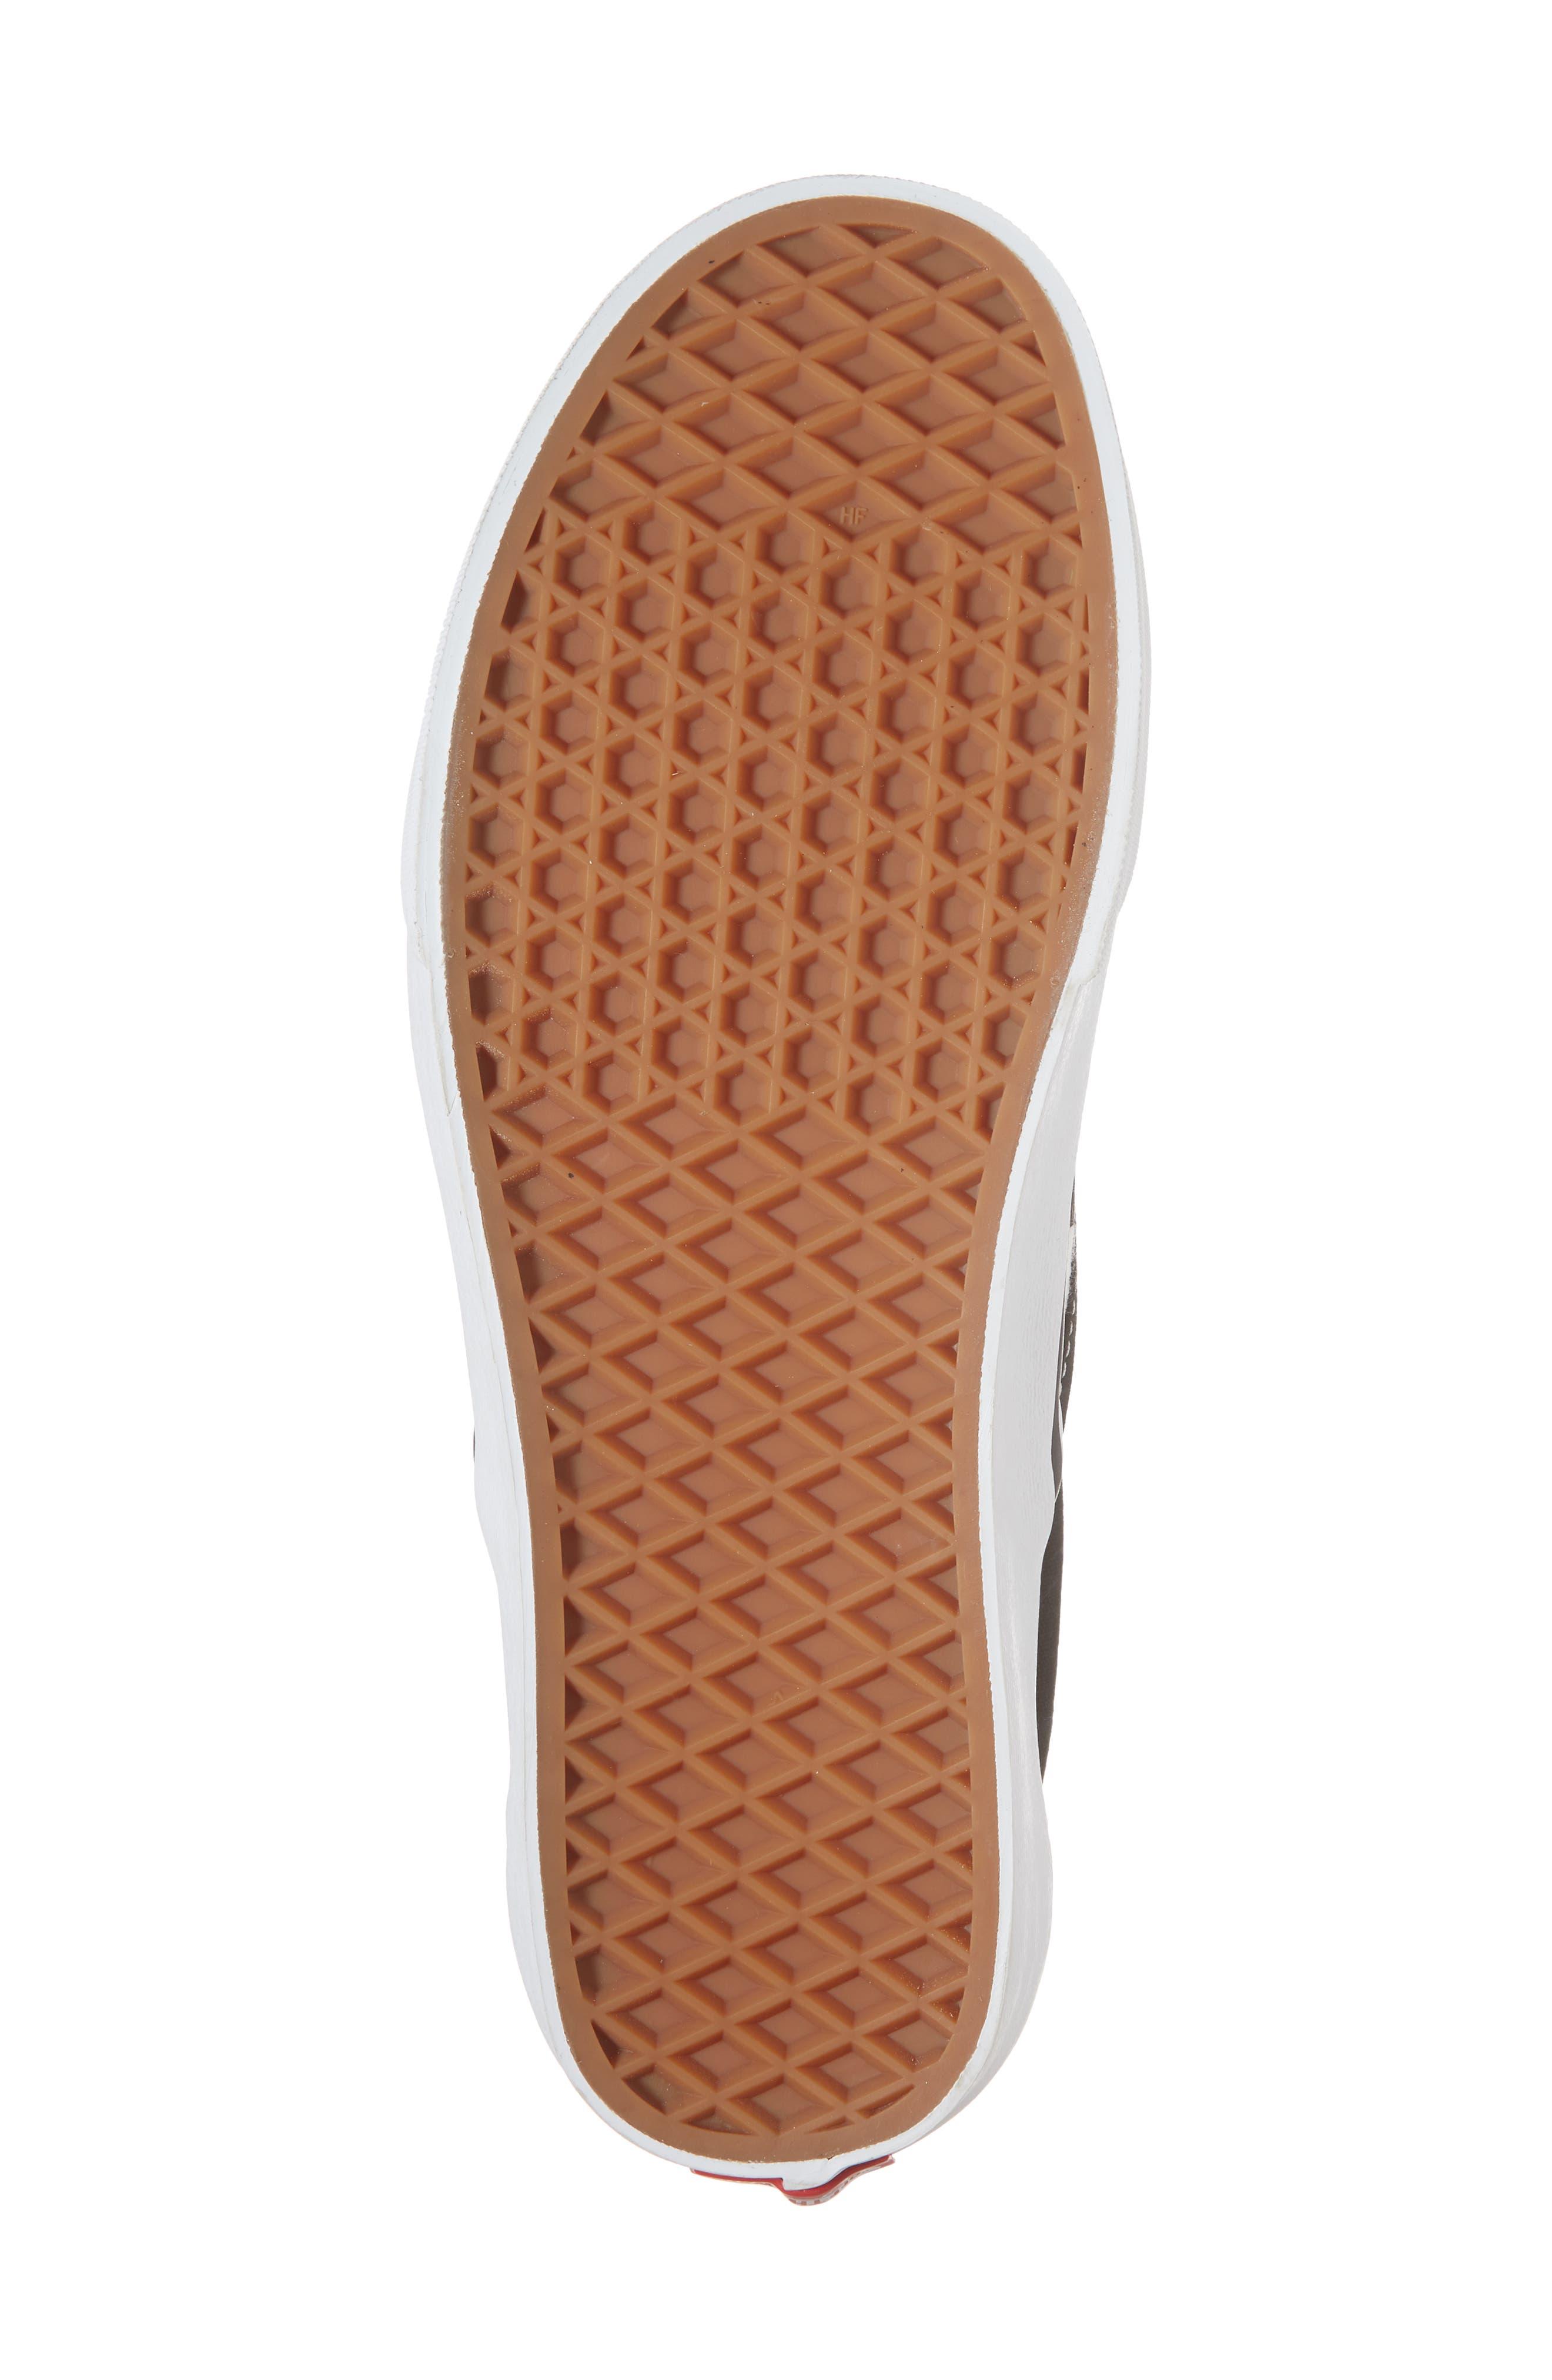 Marvel UA Classic Slip-On Sneaker,                             Alternate thumbnail 6, color,                             Checkerboard Textile